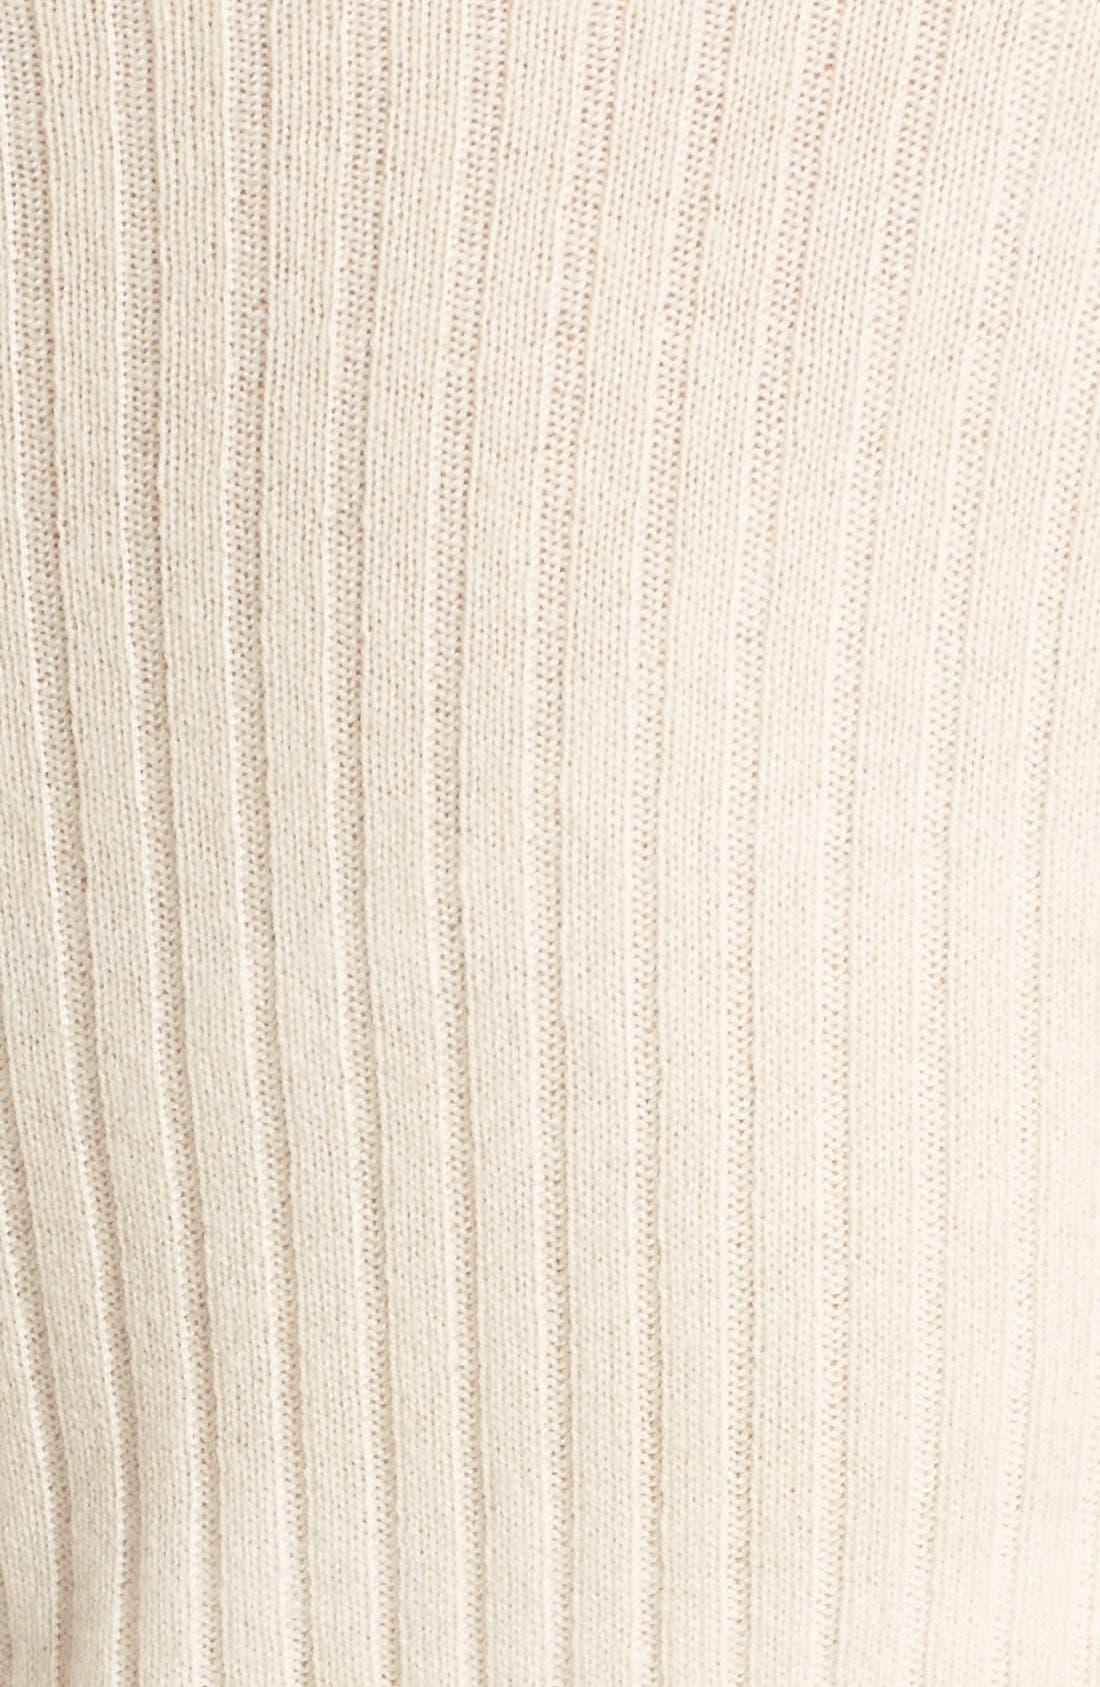 Alternate Image 3  - Alice + Olivia 'Hailee' Cowl Neck Sweater Dress